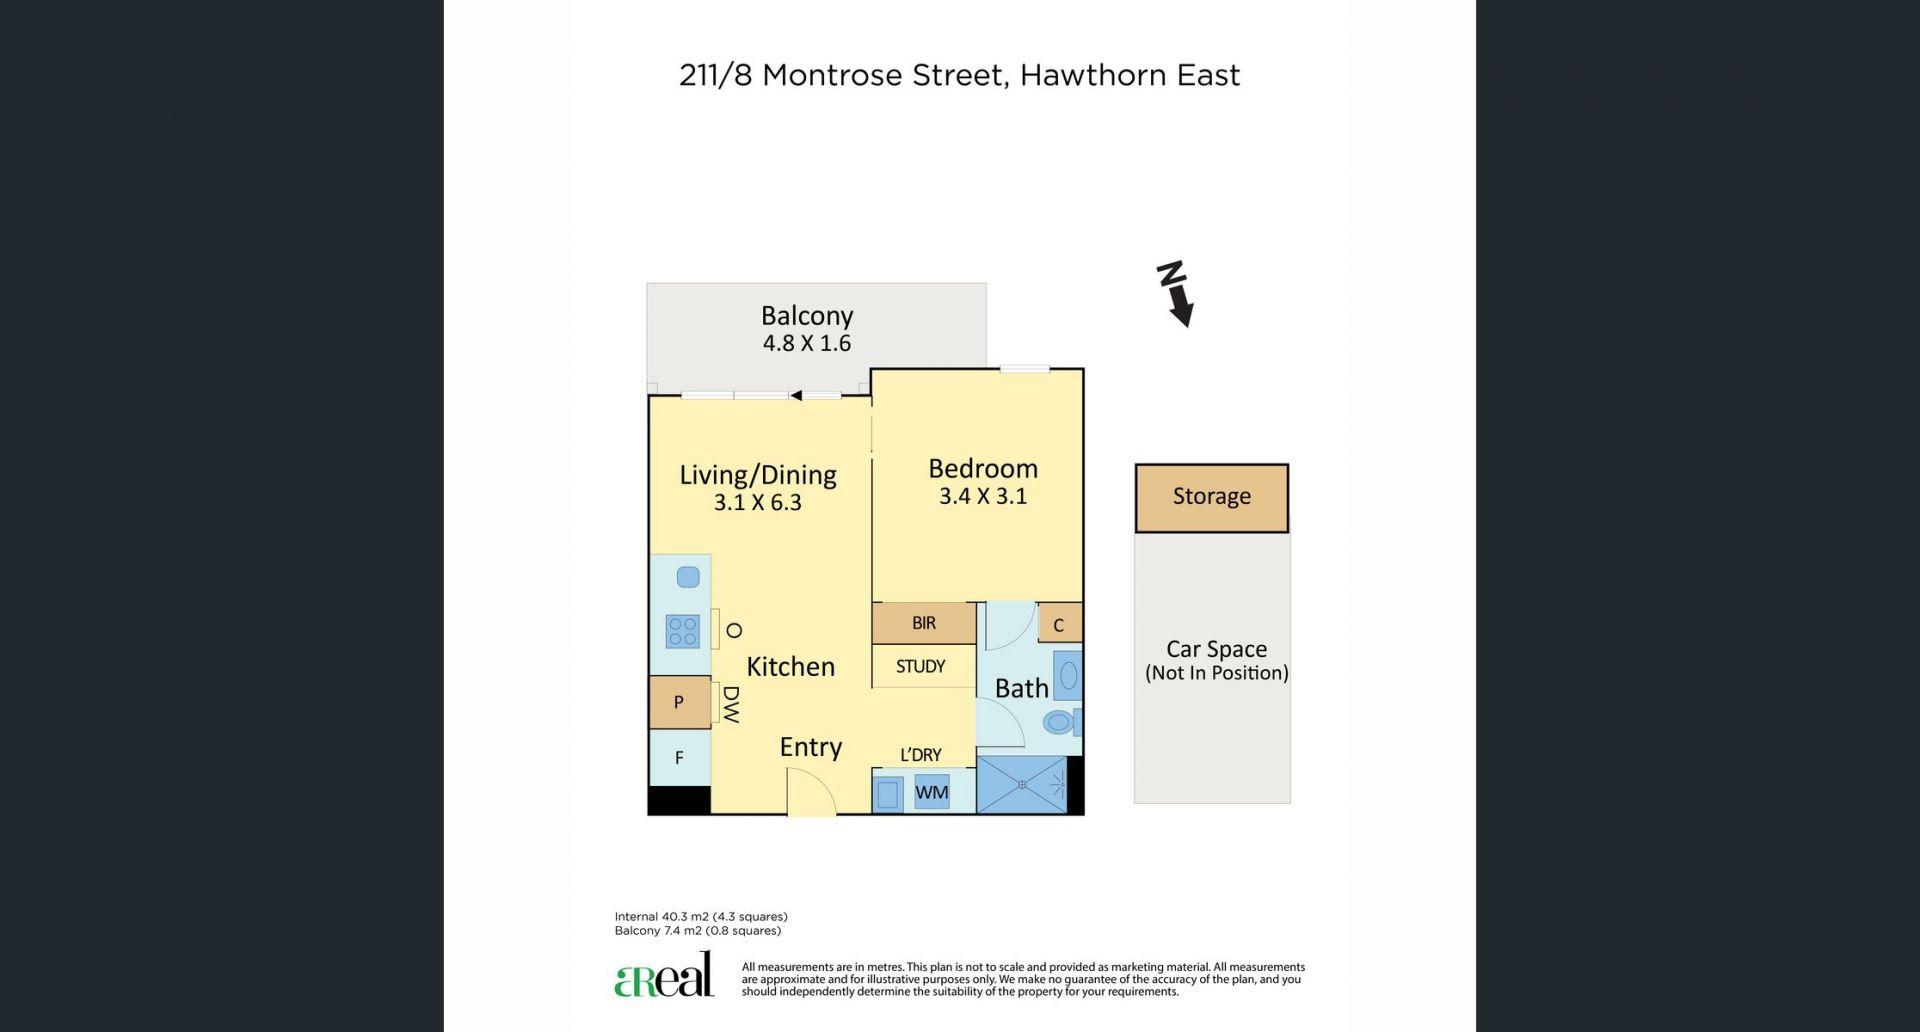 211/8 Montrose St, Hawthorn East VIC